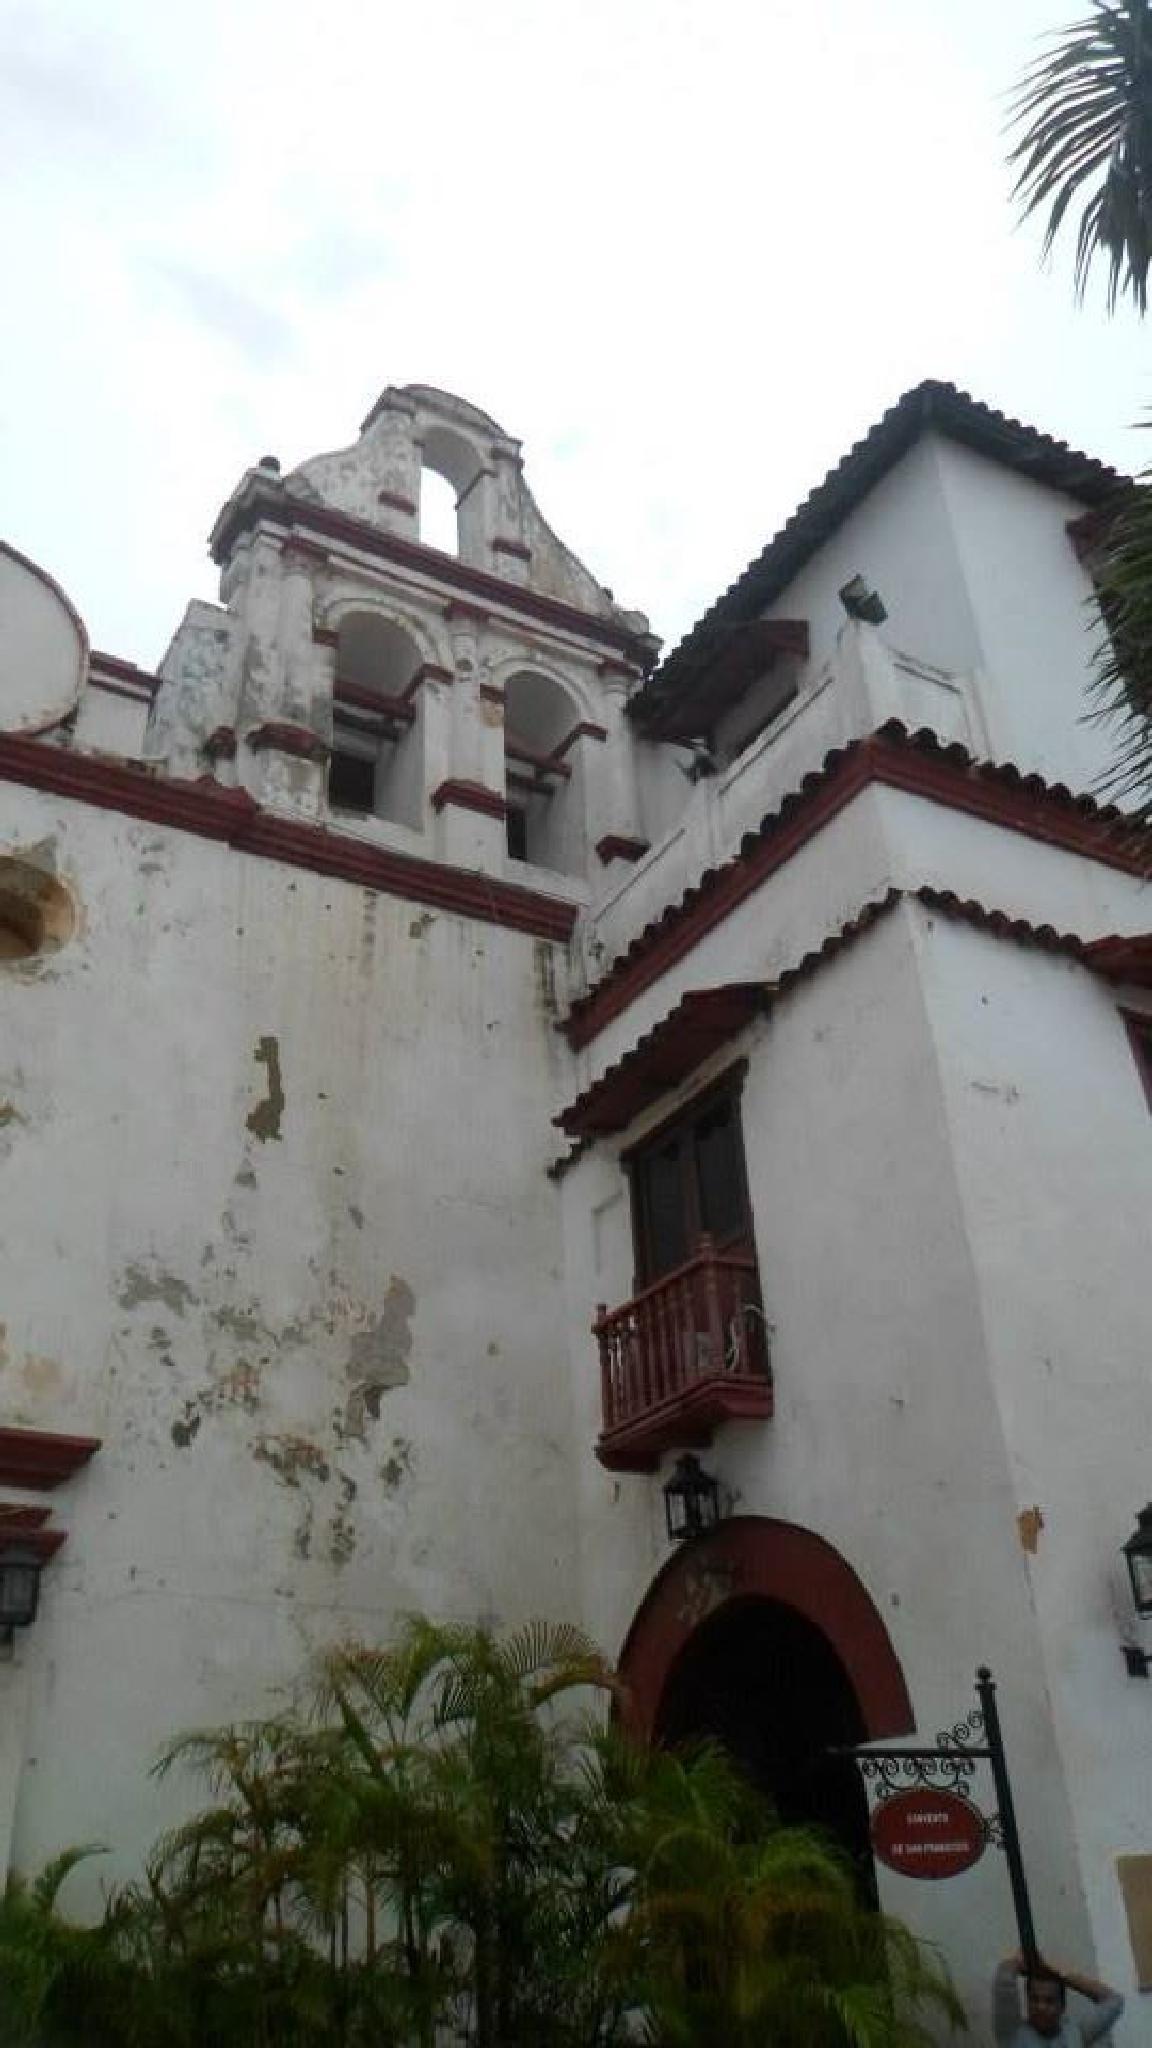 behind San Roque church in Cartagena by castariza